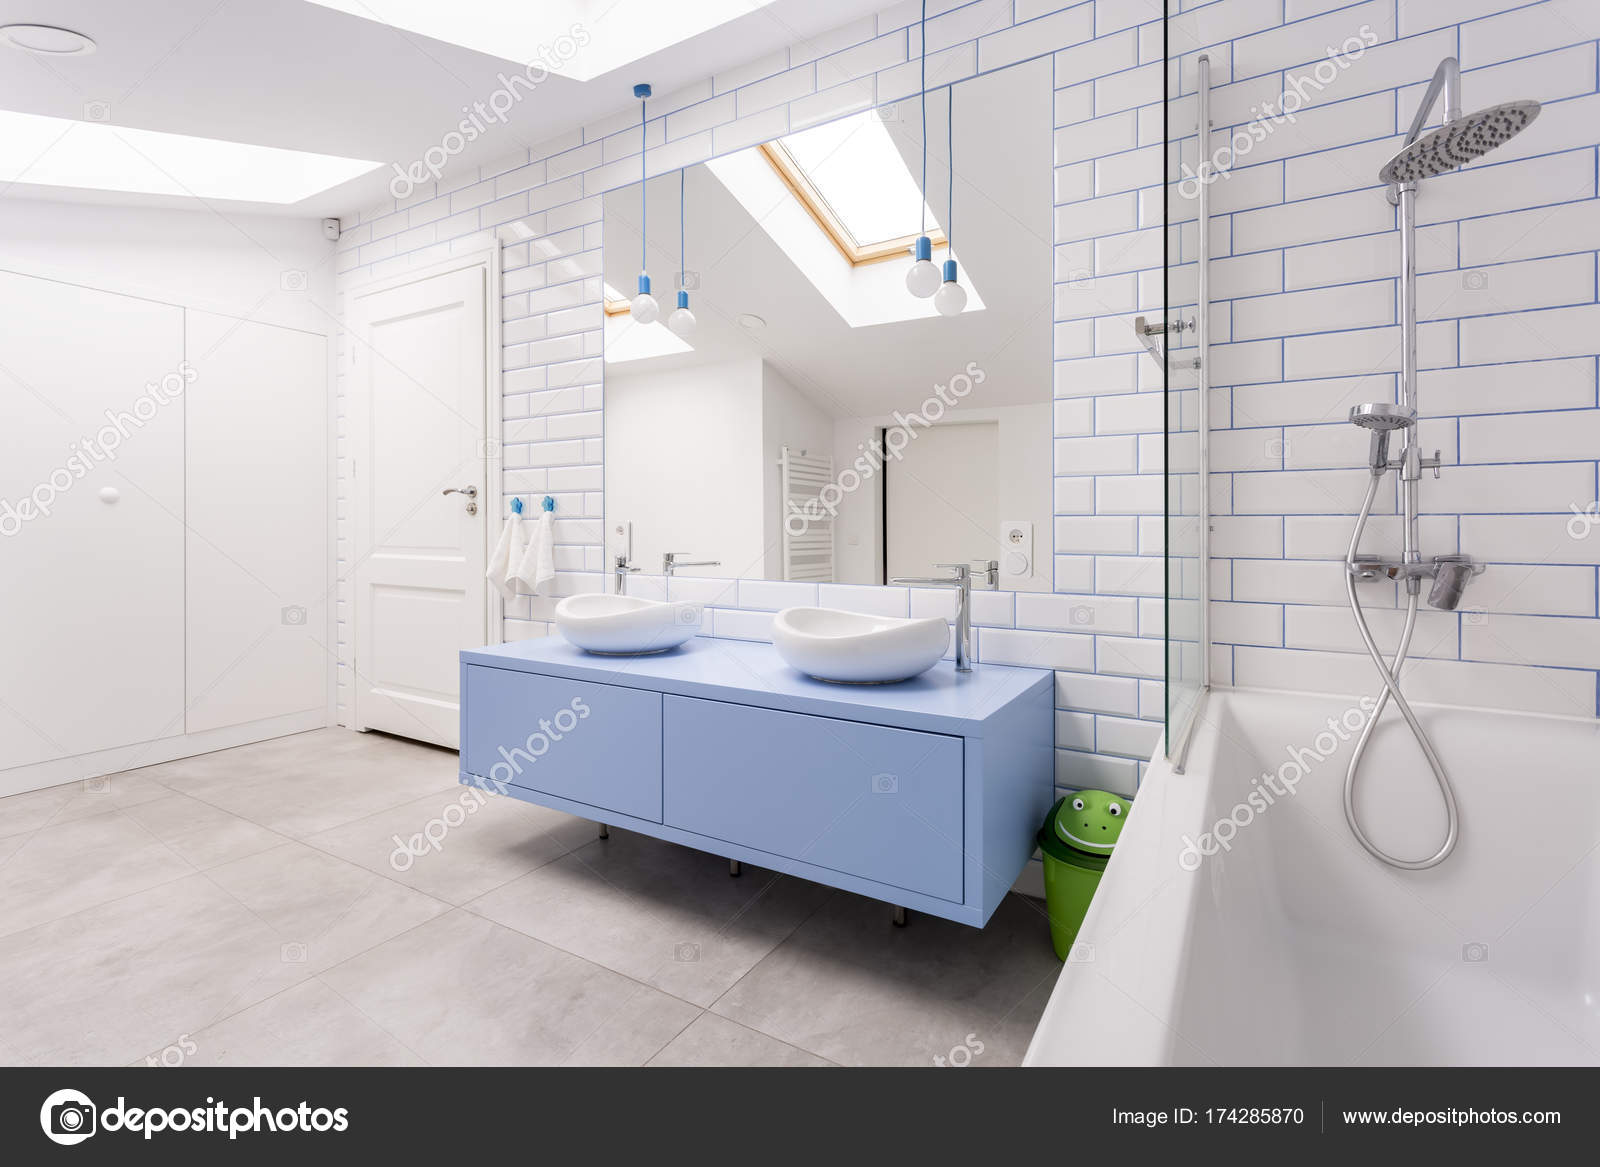 Helles Badezimmer Mit Blauen Schrank Stockfoto C Photographee Eu